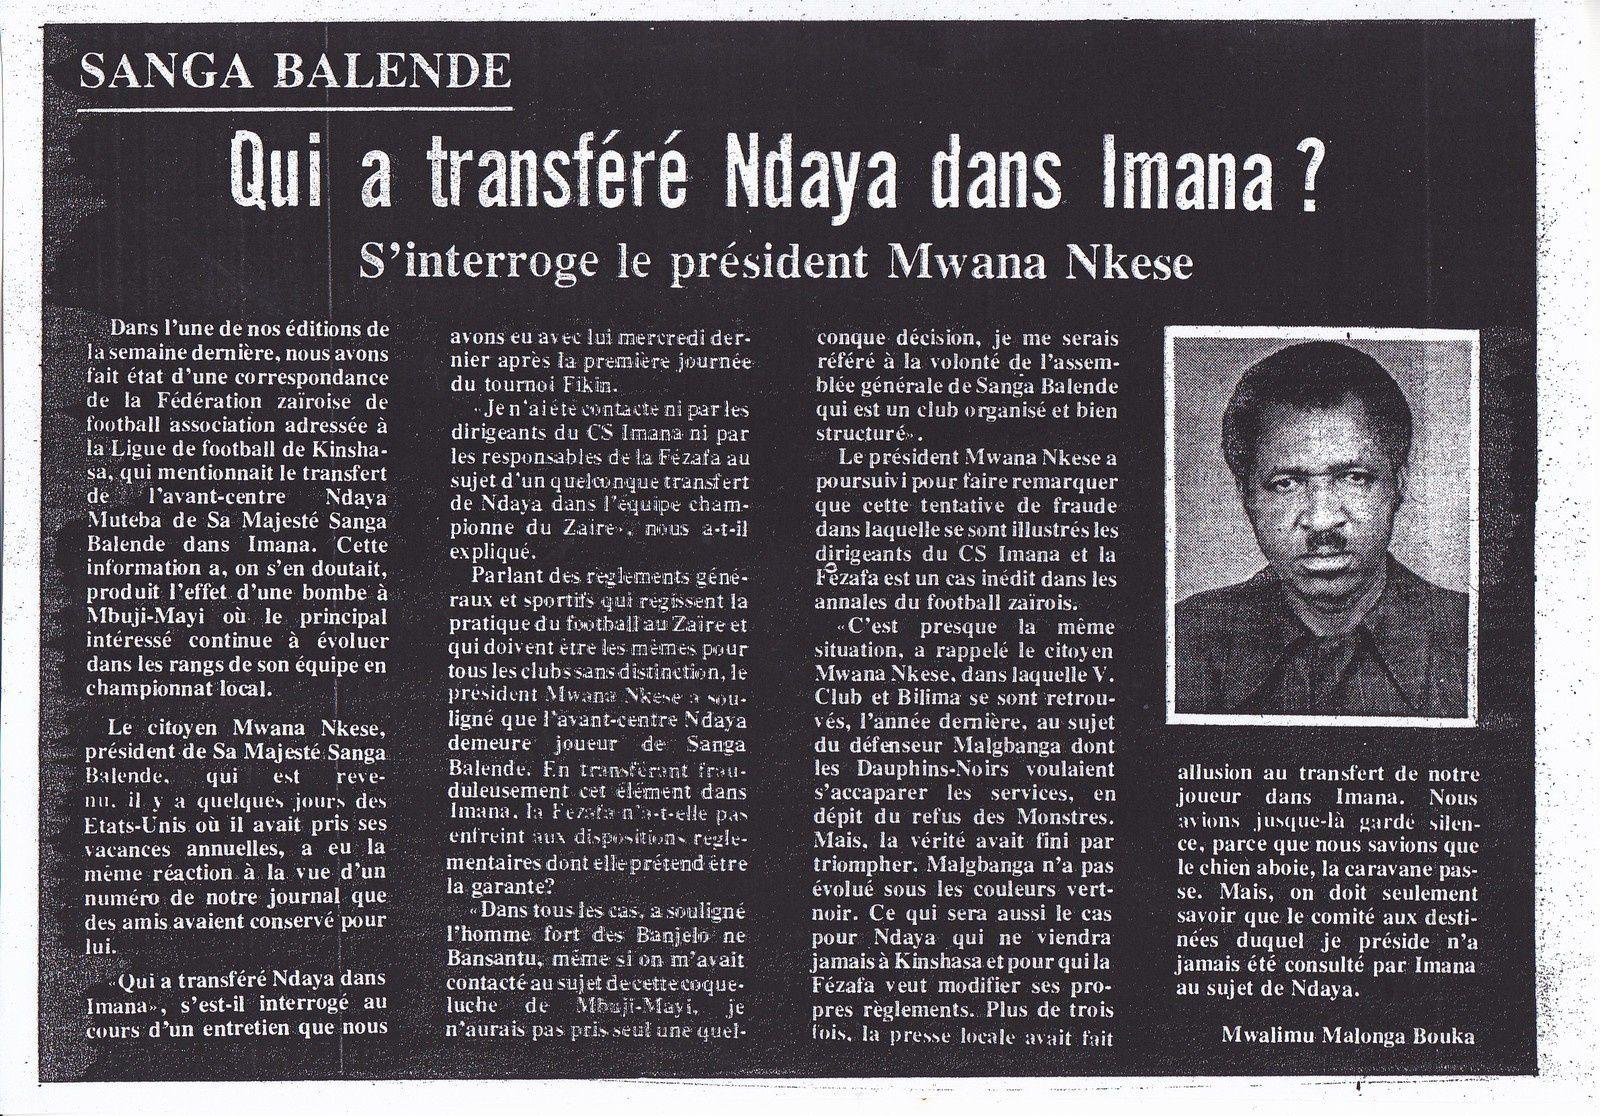 Mwana Nkese , président de S.M Sanga Balende